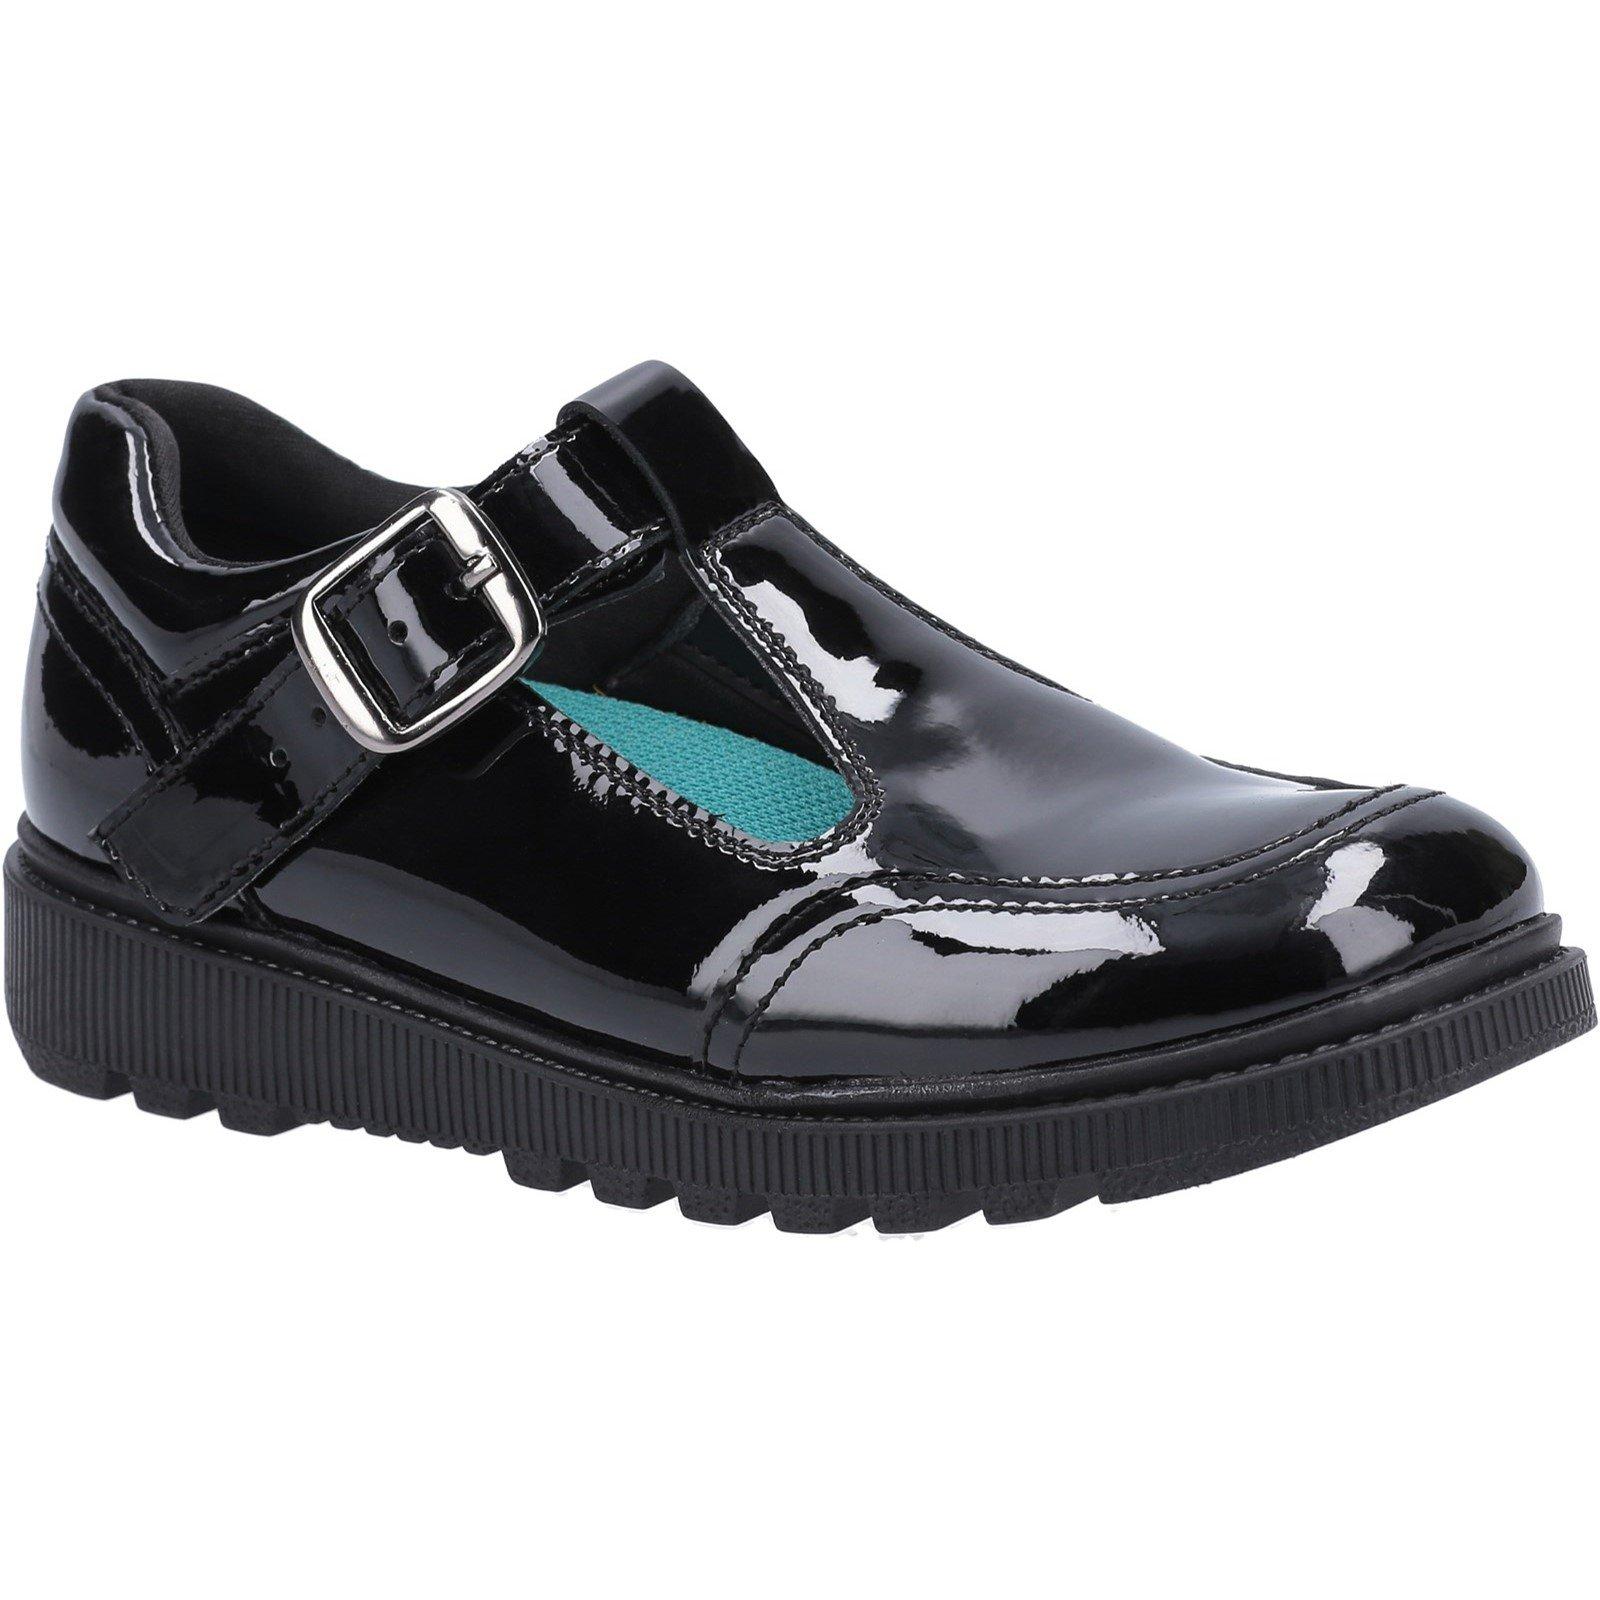 Hush Puppies Kid's Kerry Senior School Shoe Patent Black 30820 - Patent Black 4